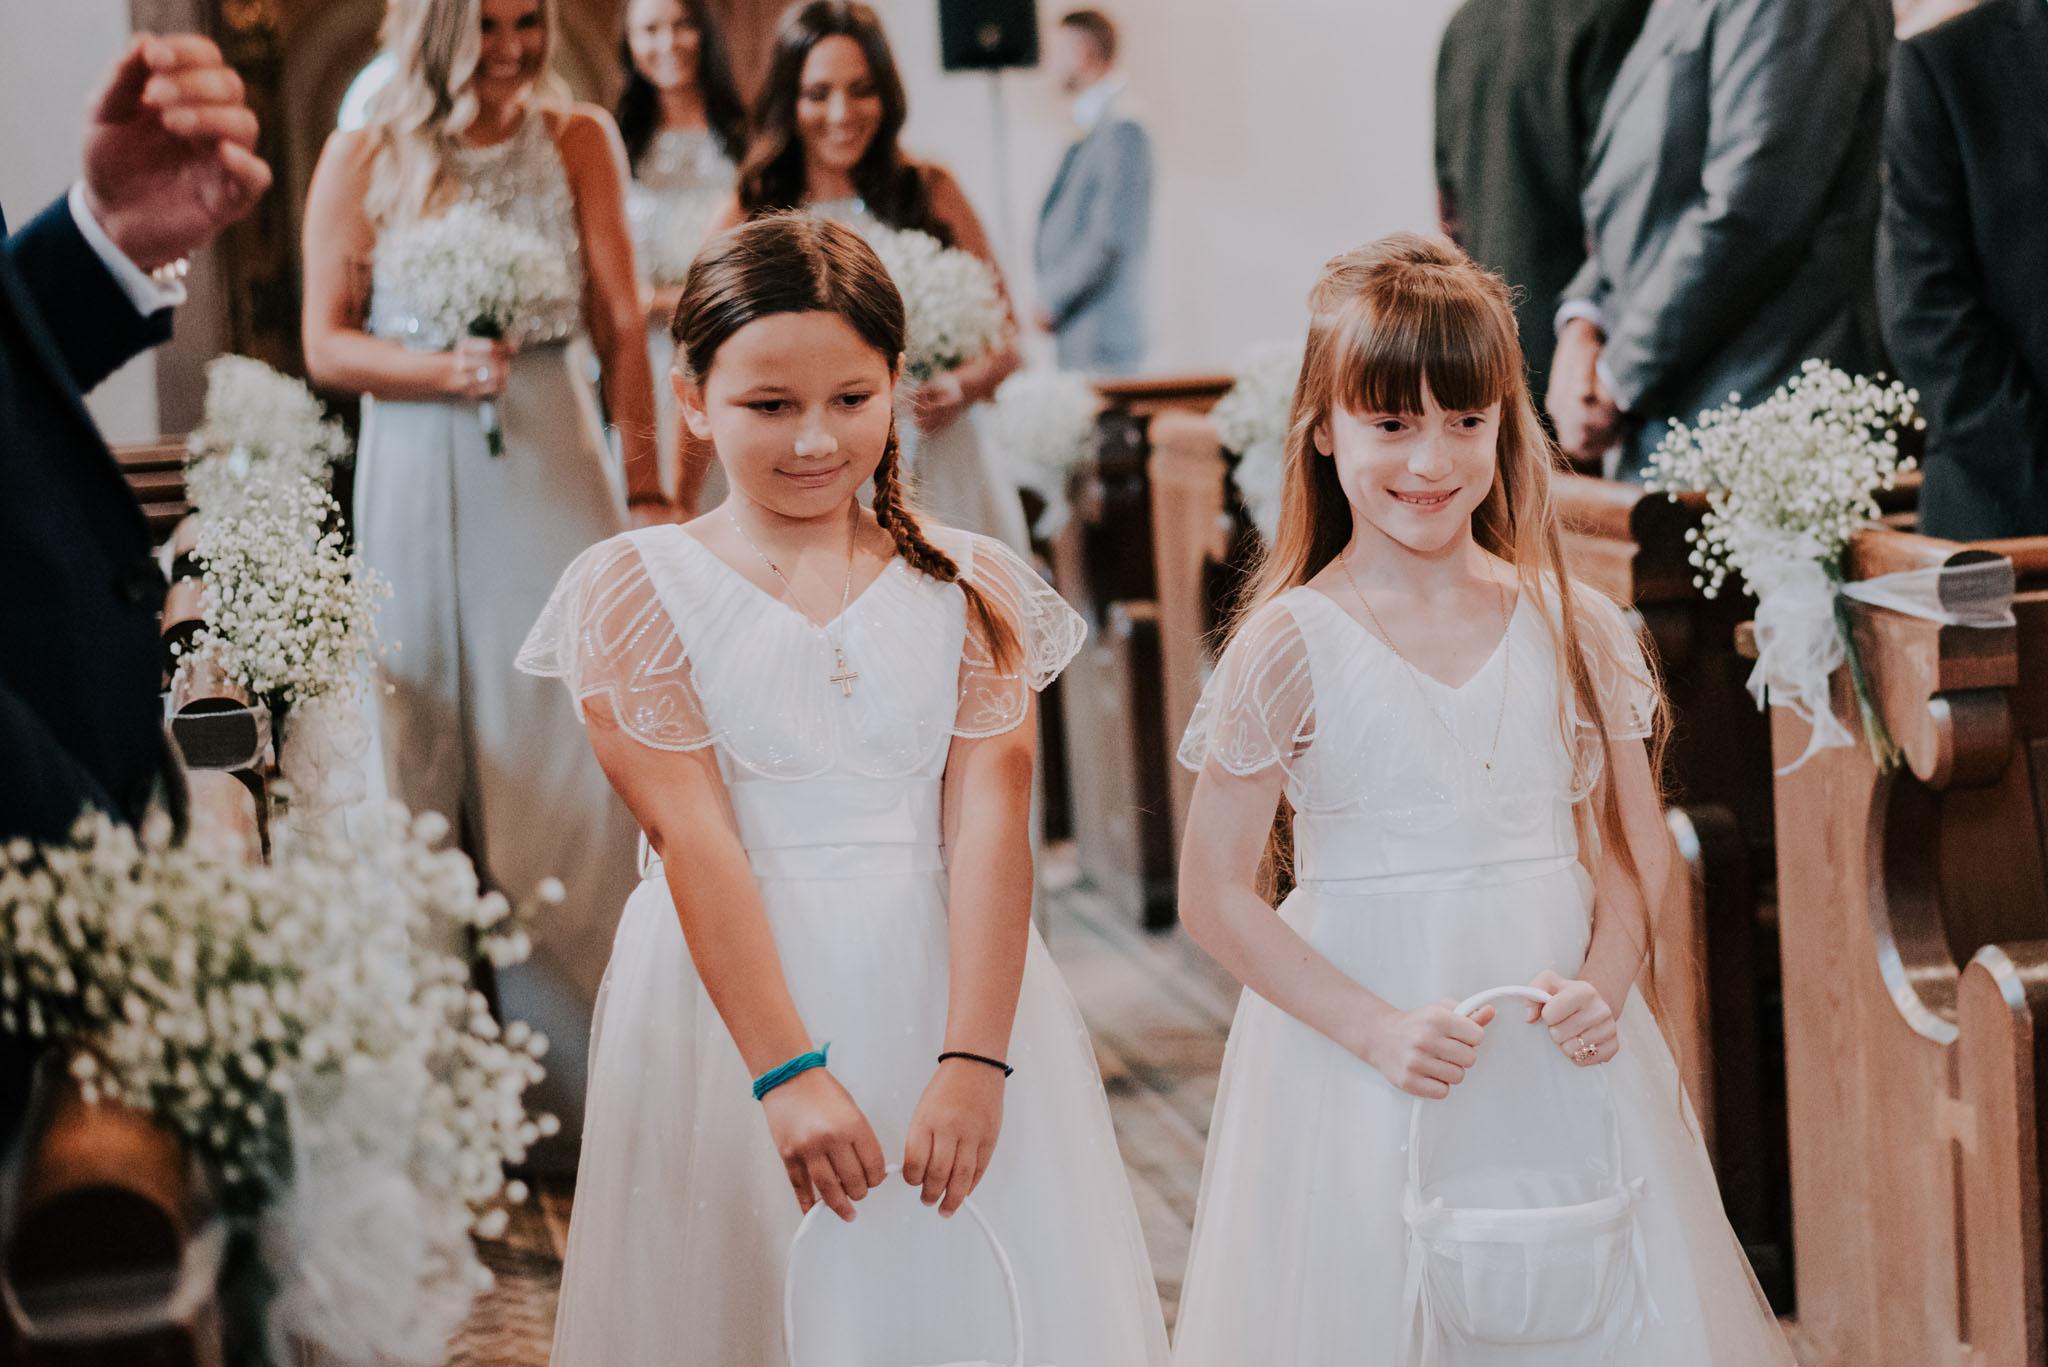 wedding-photographer-glewstone-court-hereford-scott-stockwell-photography157.jpg